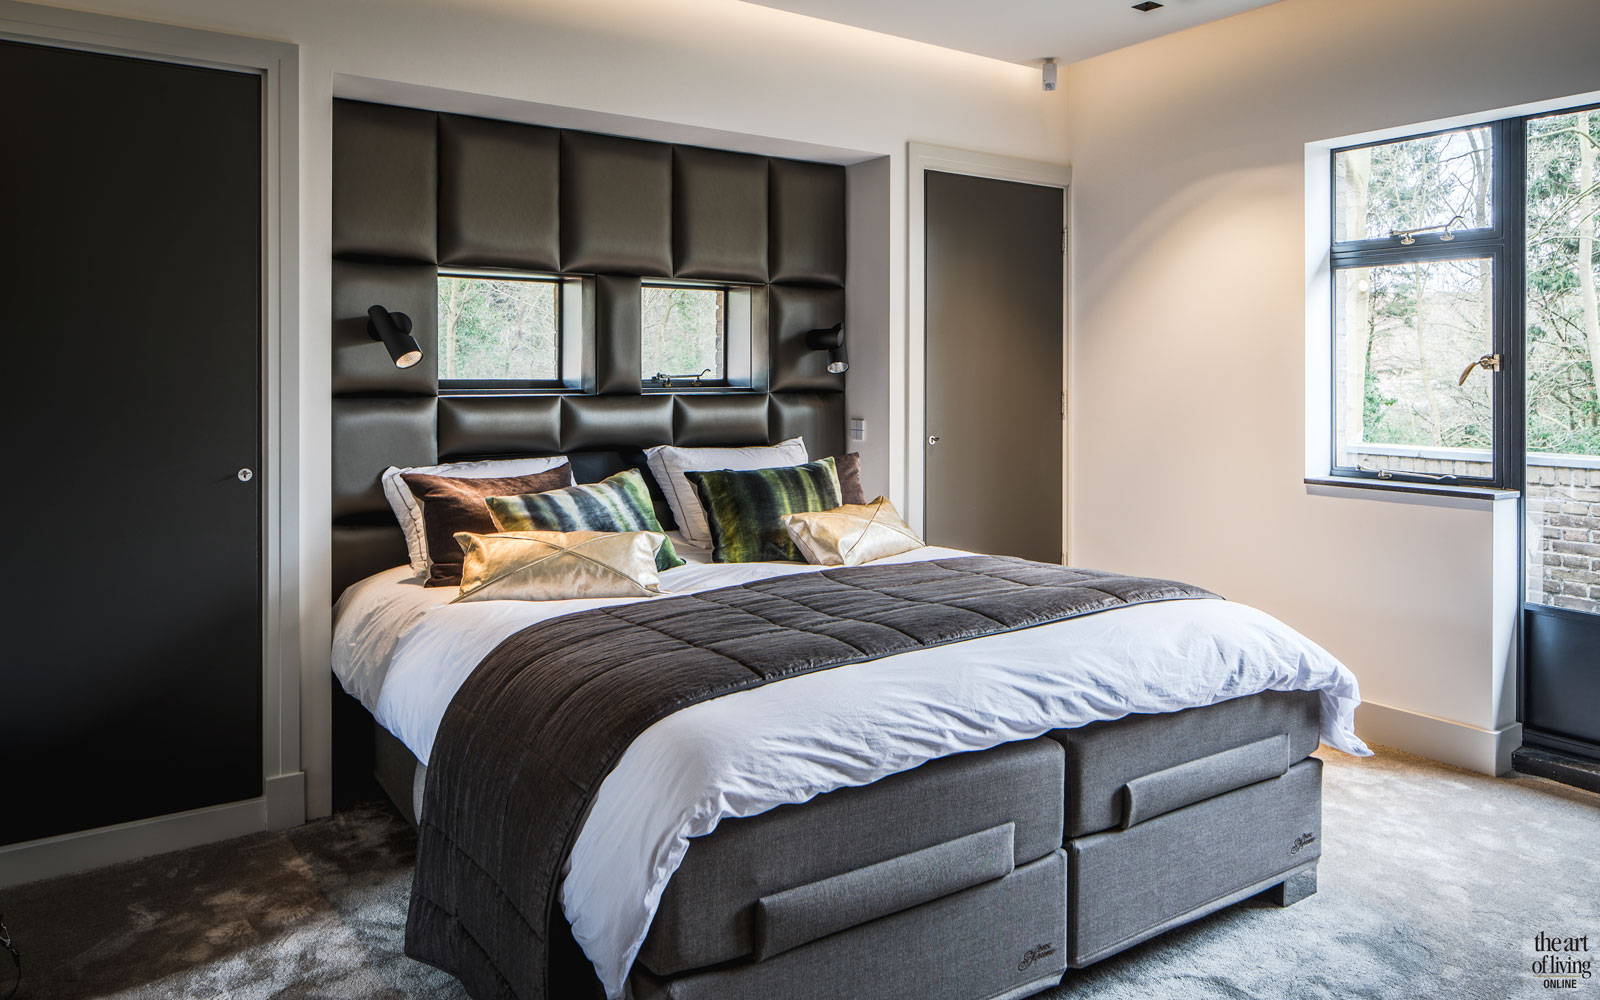 Slaapkamer, master bedroom, bed, boxspring, Jensen Beds, monumentale villa, Van den Wildenberg